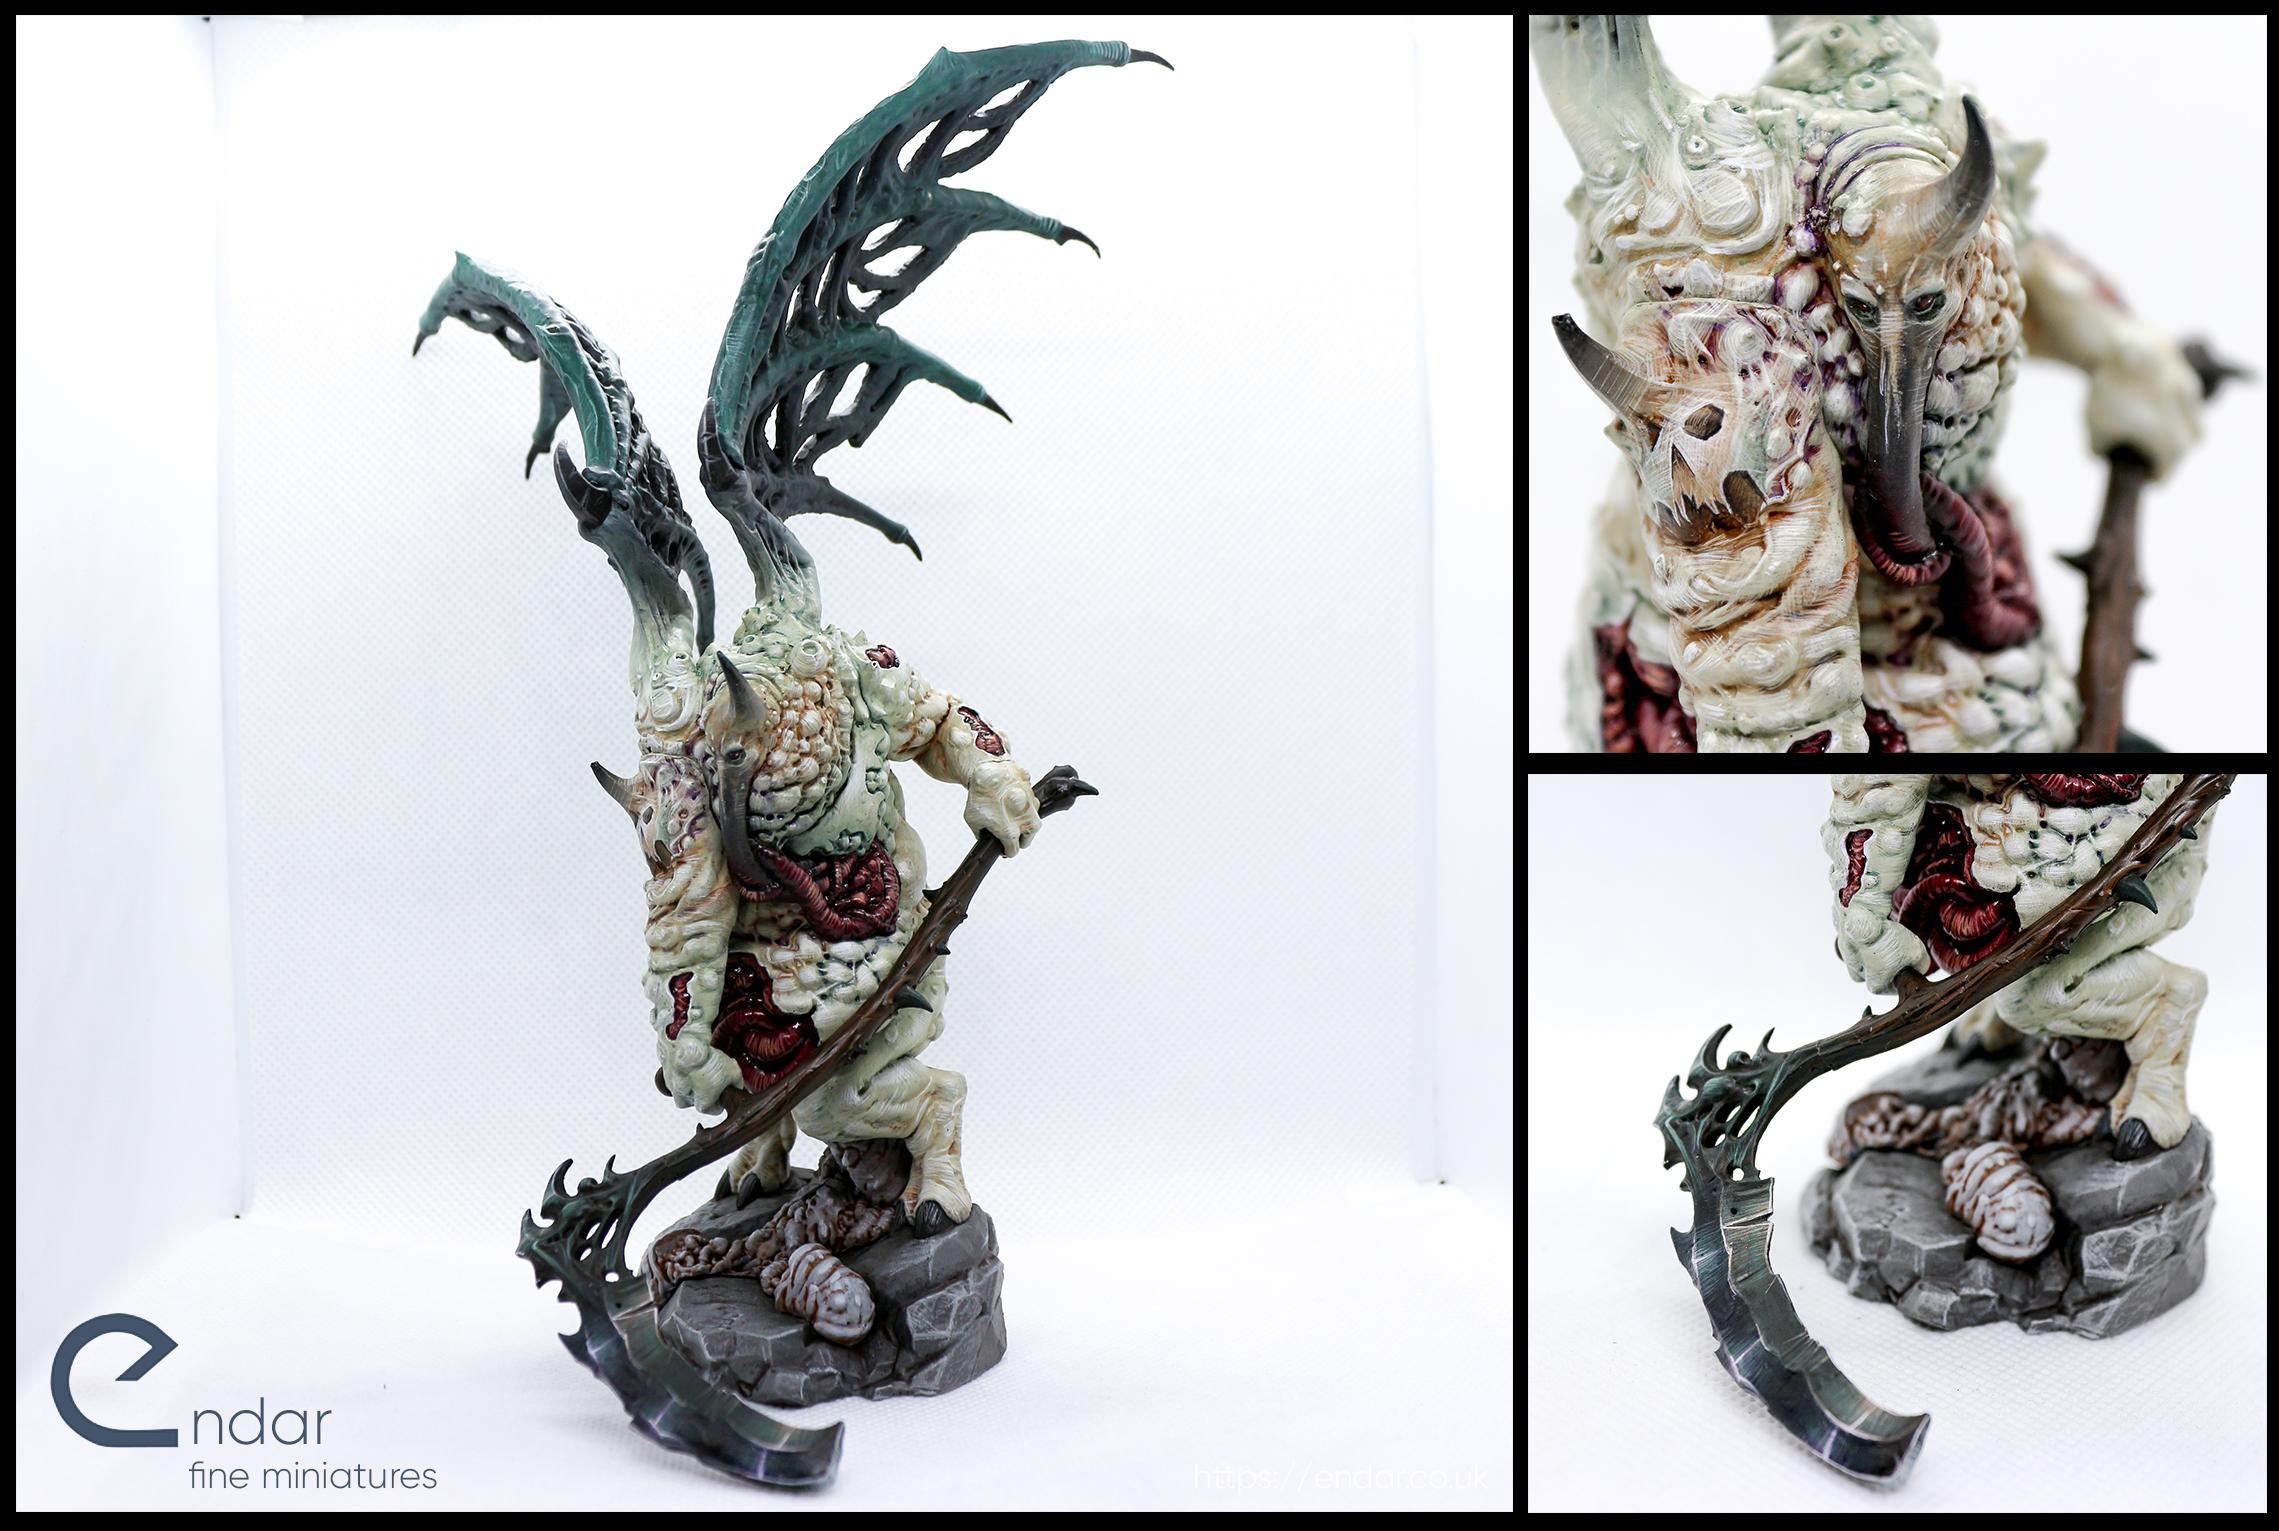 Endar Lord of Virulence Creaturecaster